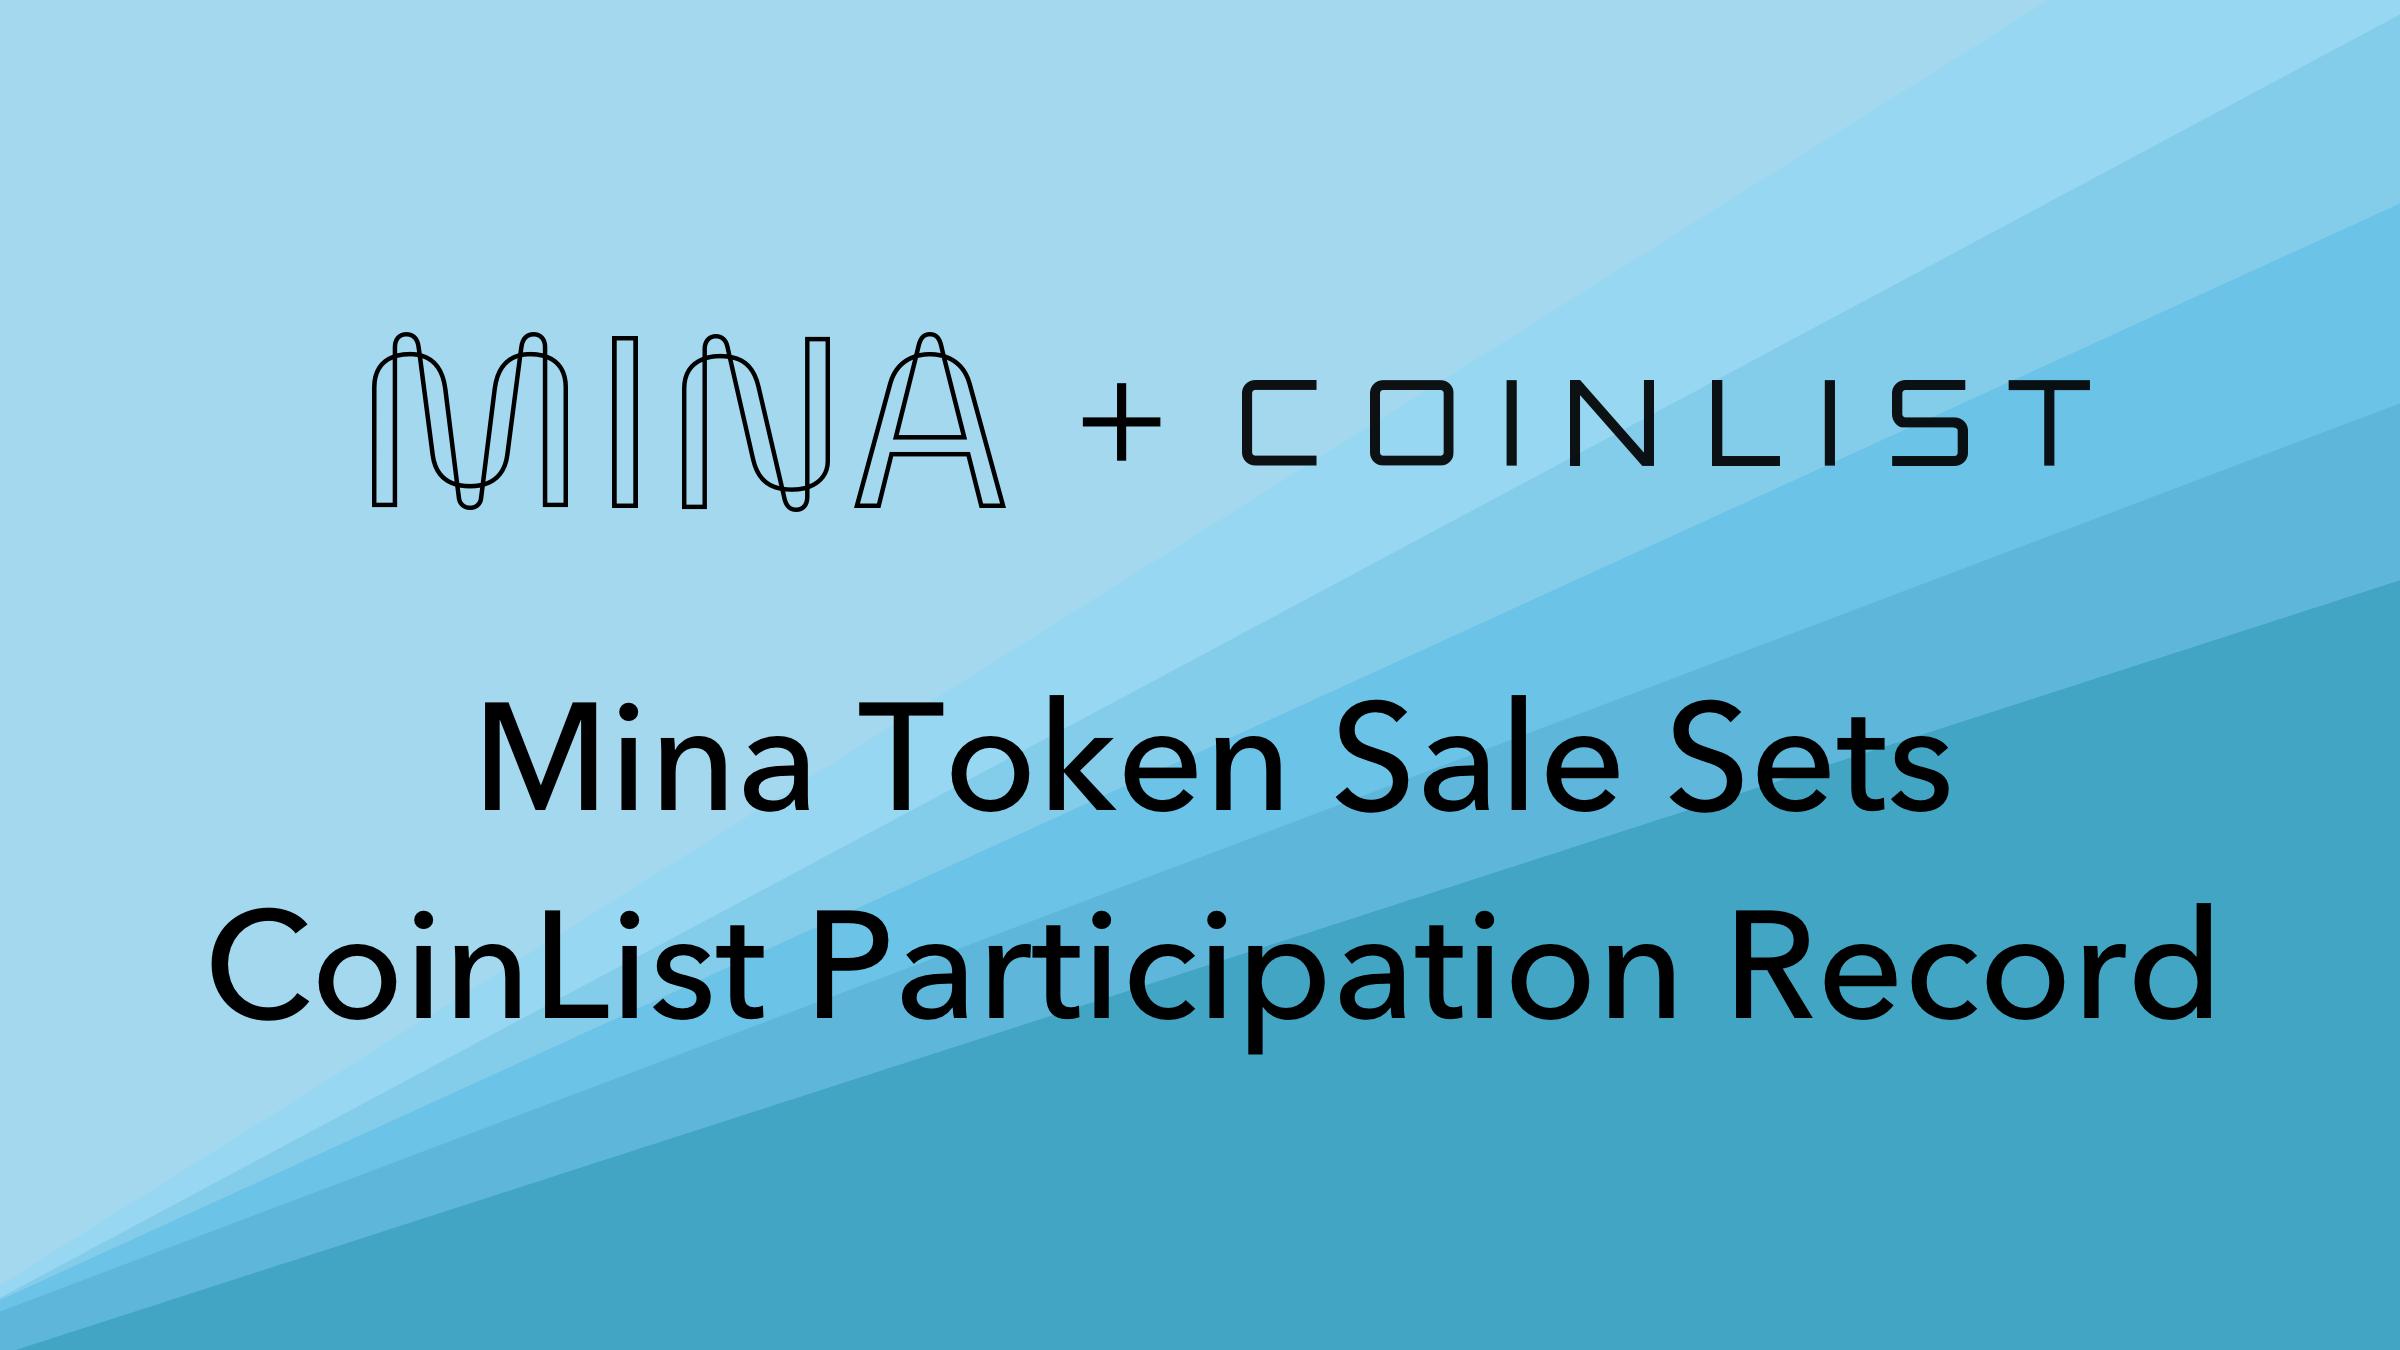 [Coinlist] Mina Token Sale Sets Participation Record on CoinList